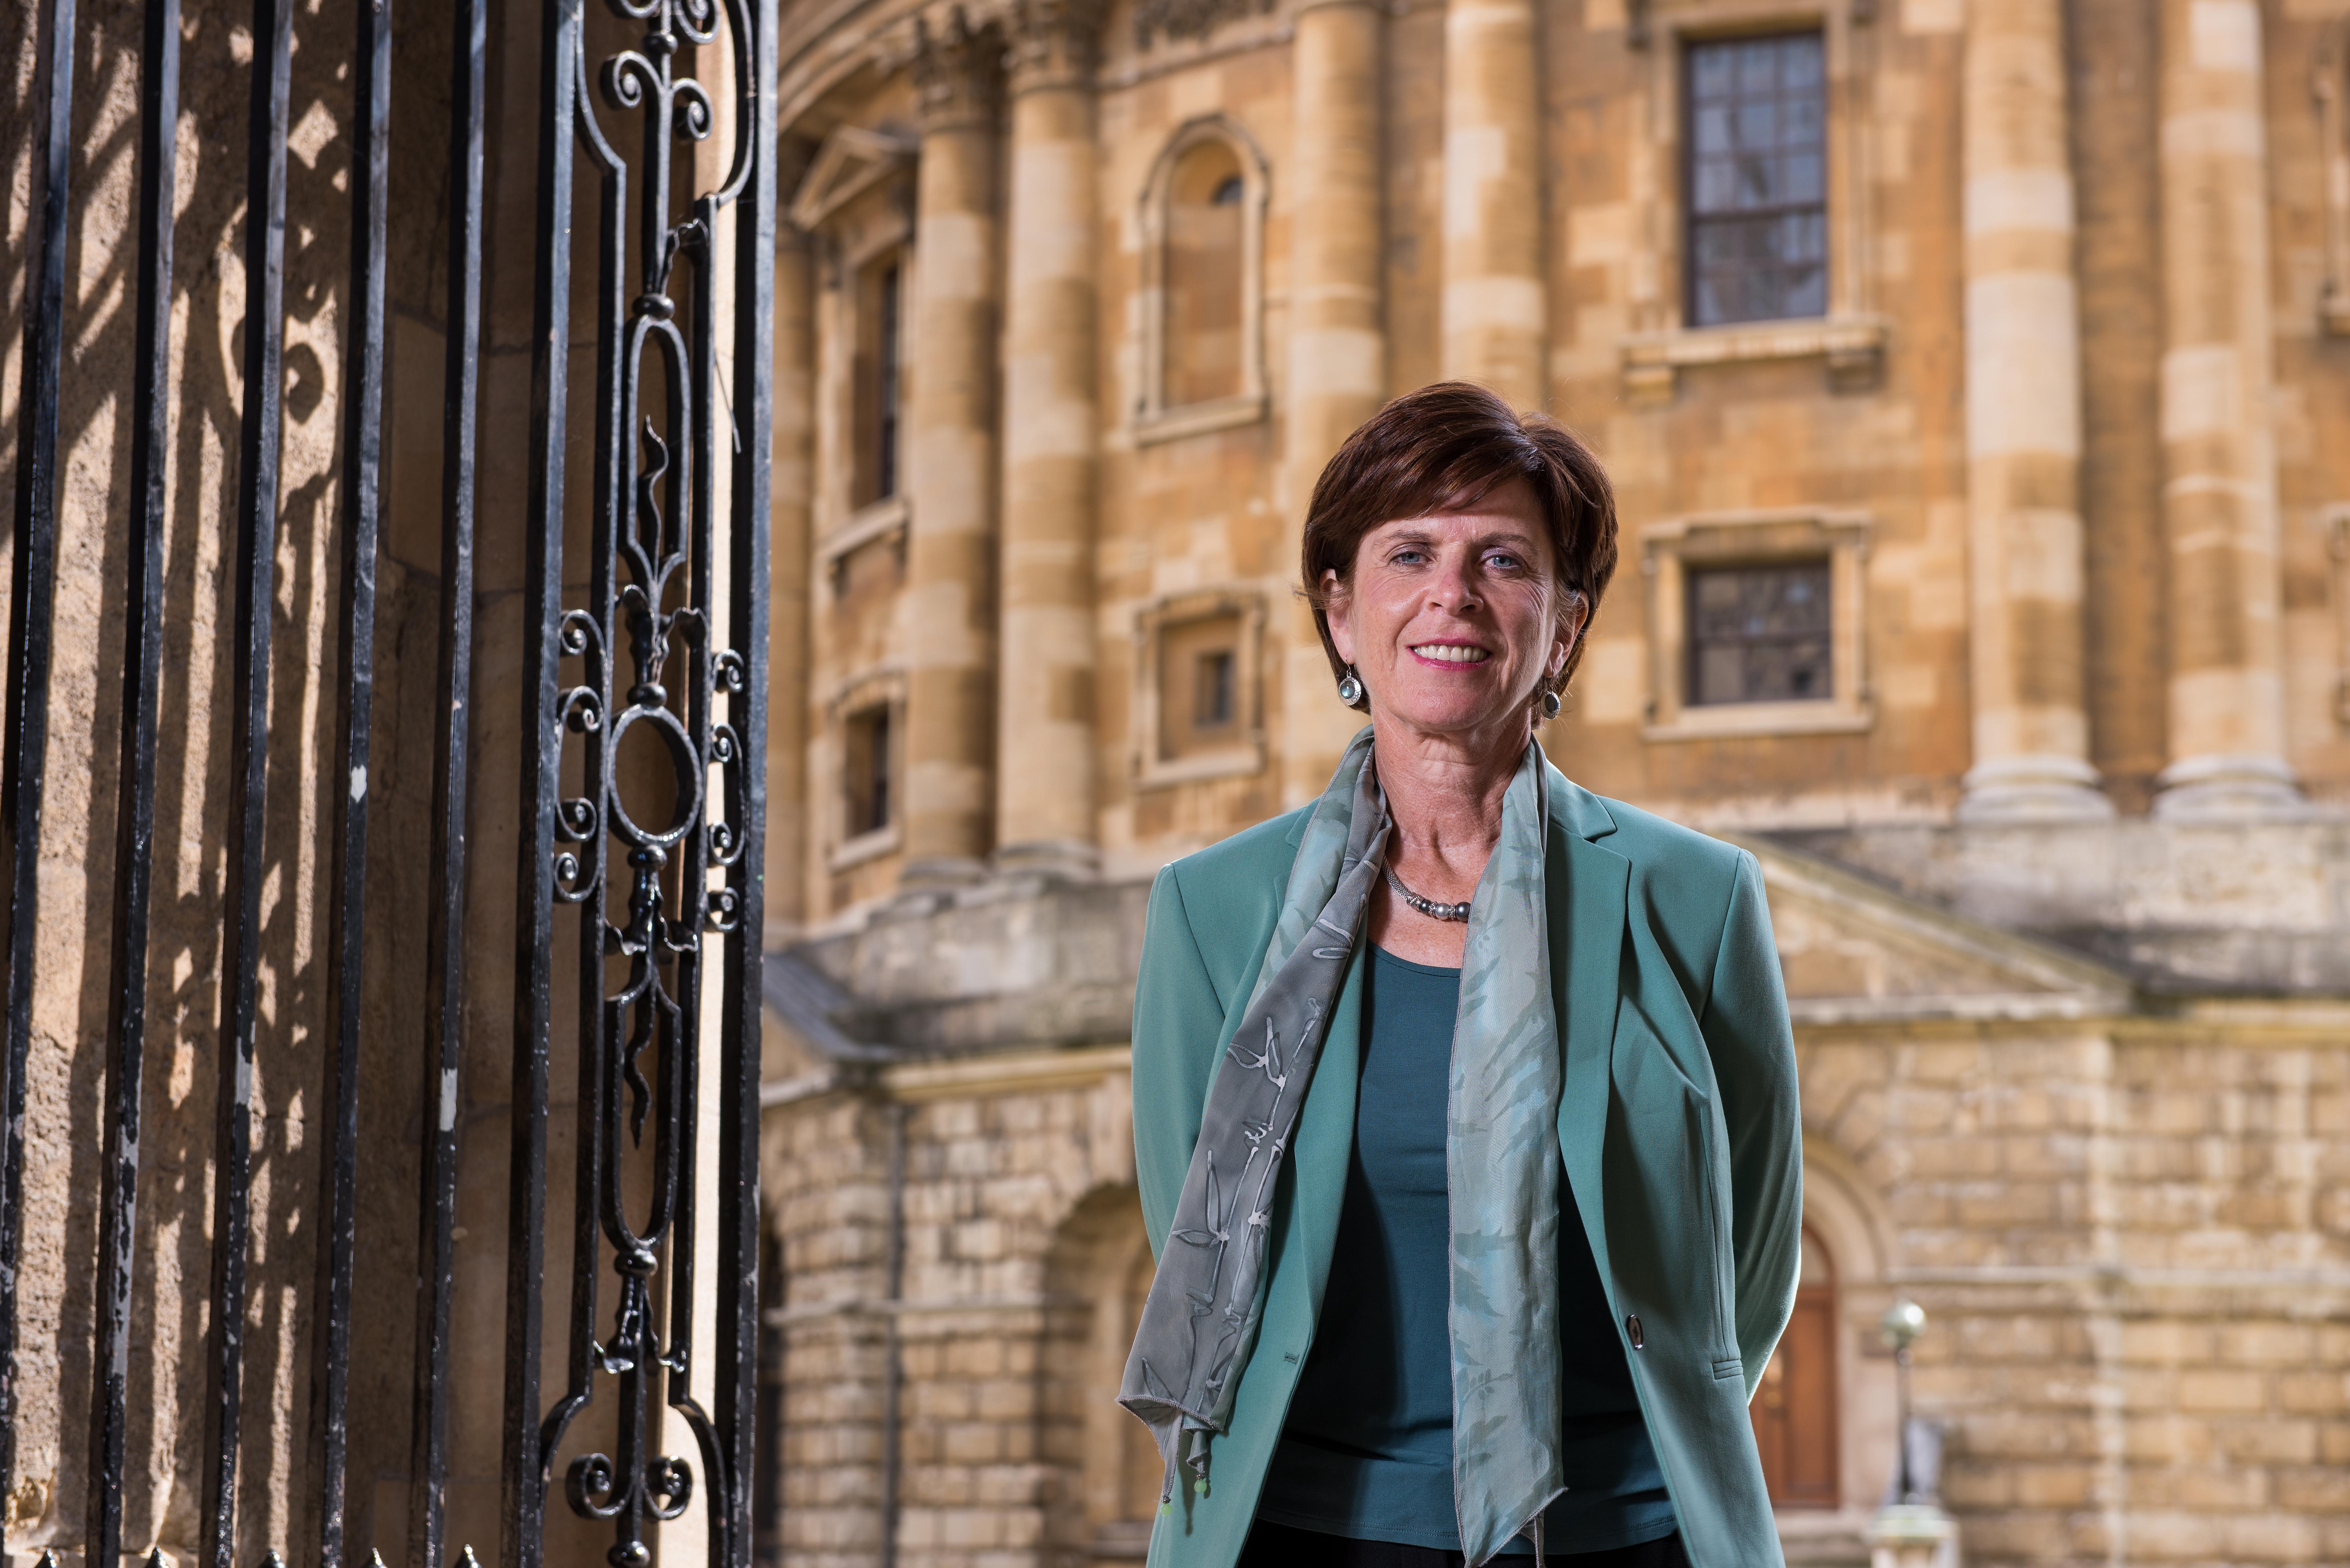 New Vice-Chancellor pledges 'innovative, creative' future for Oxford